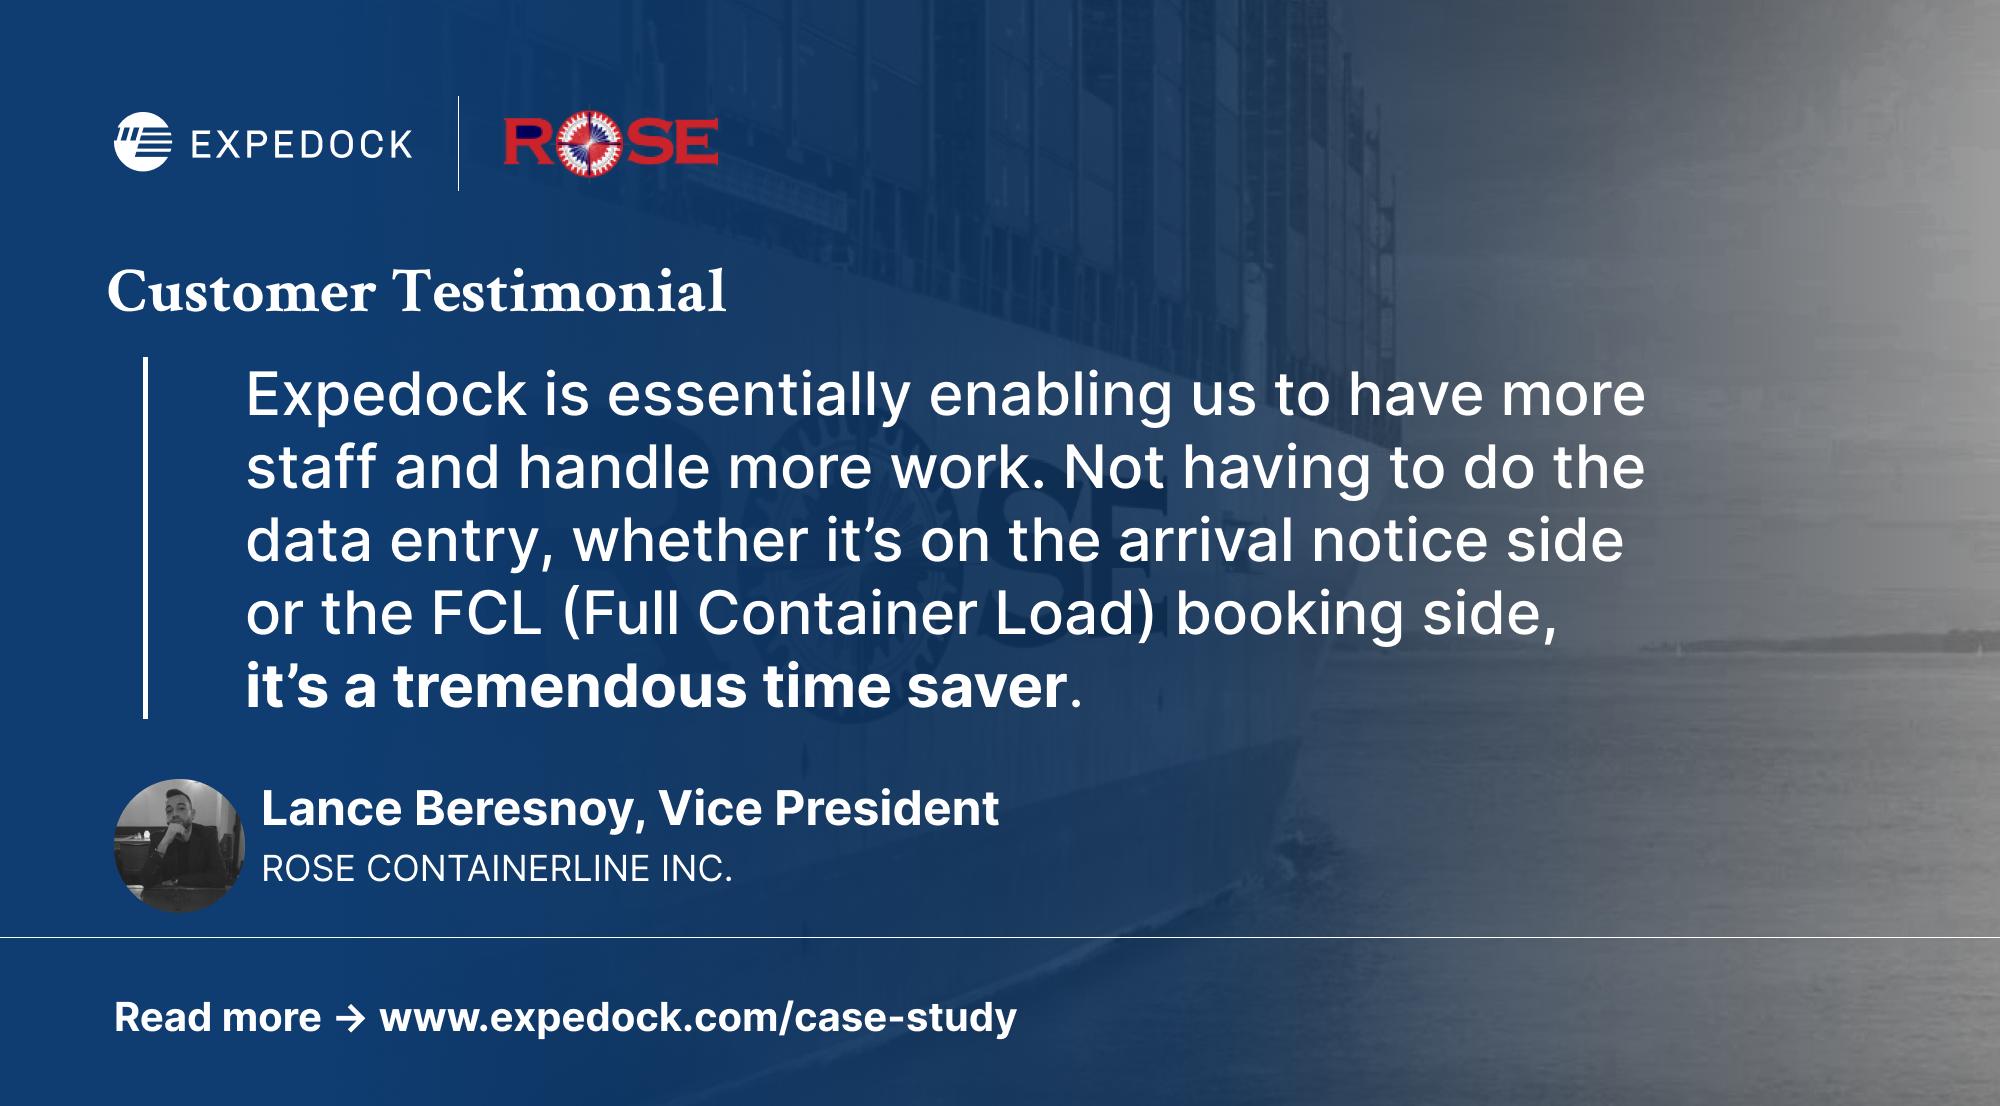 https://www.expedock.com/case-study